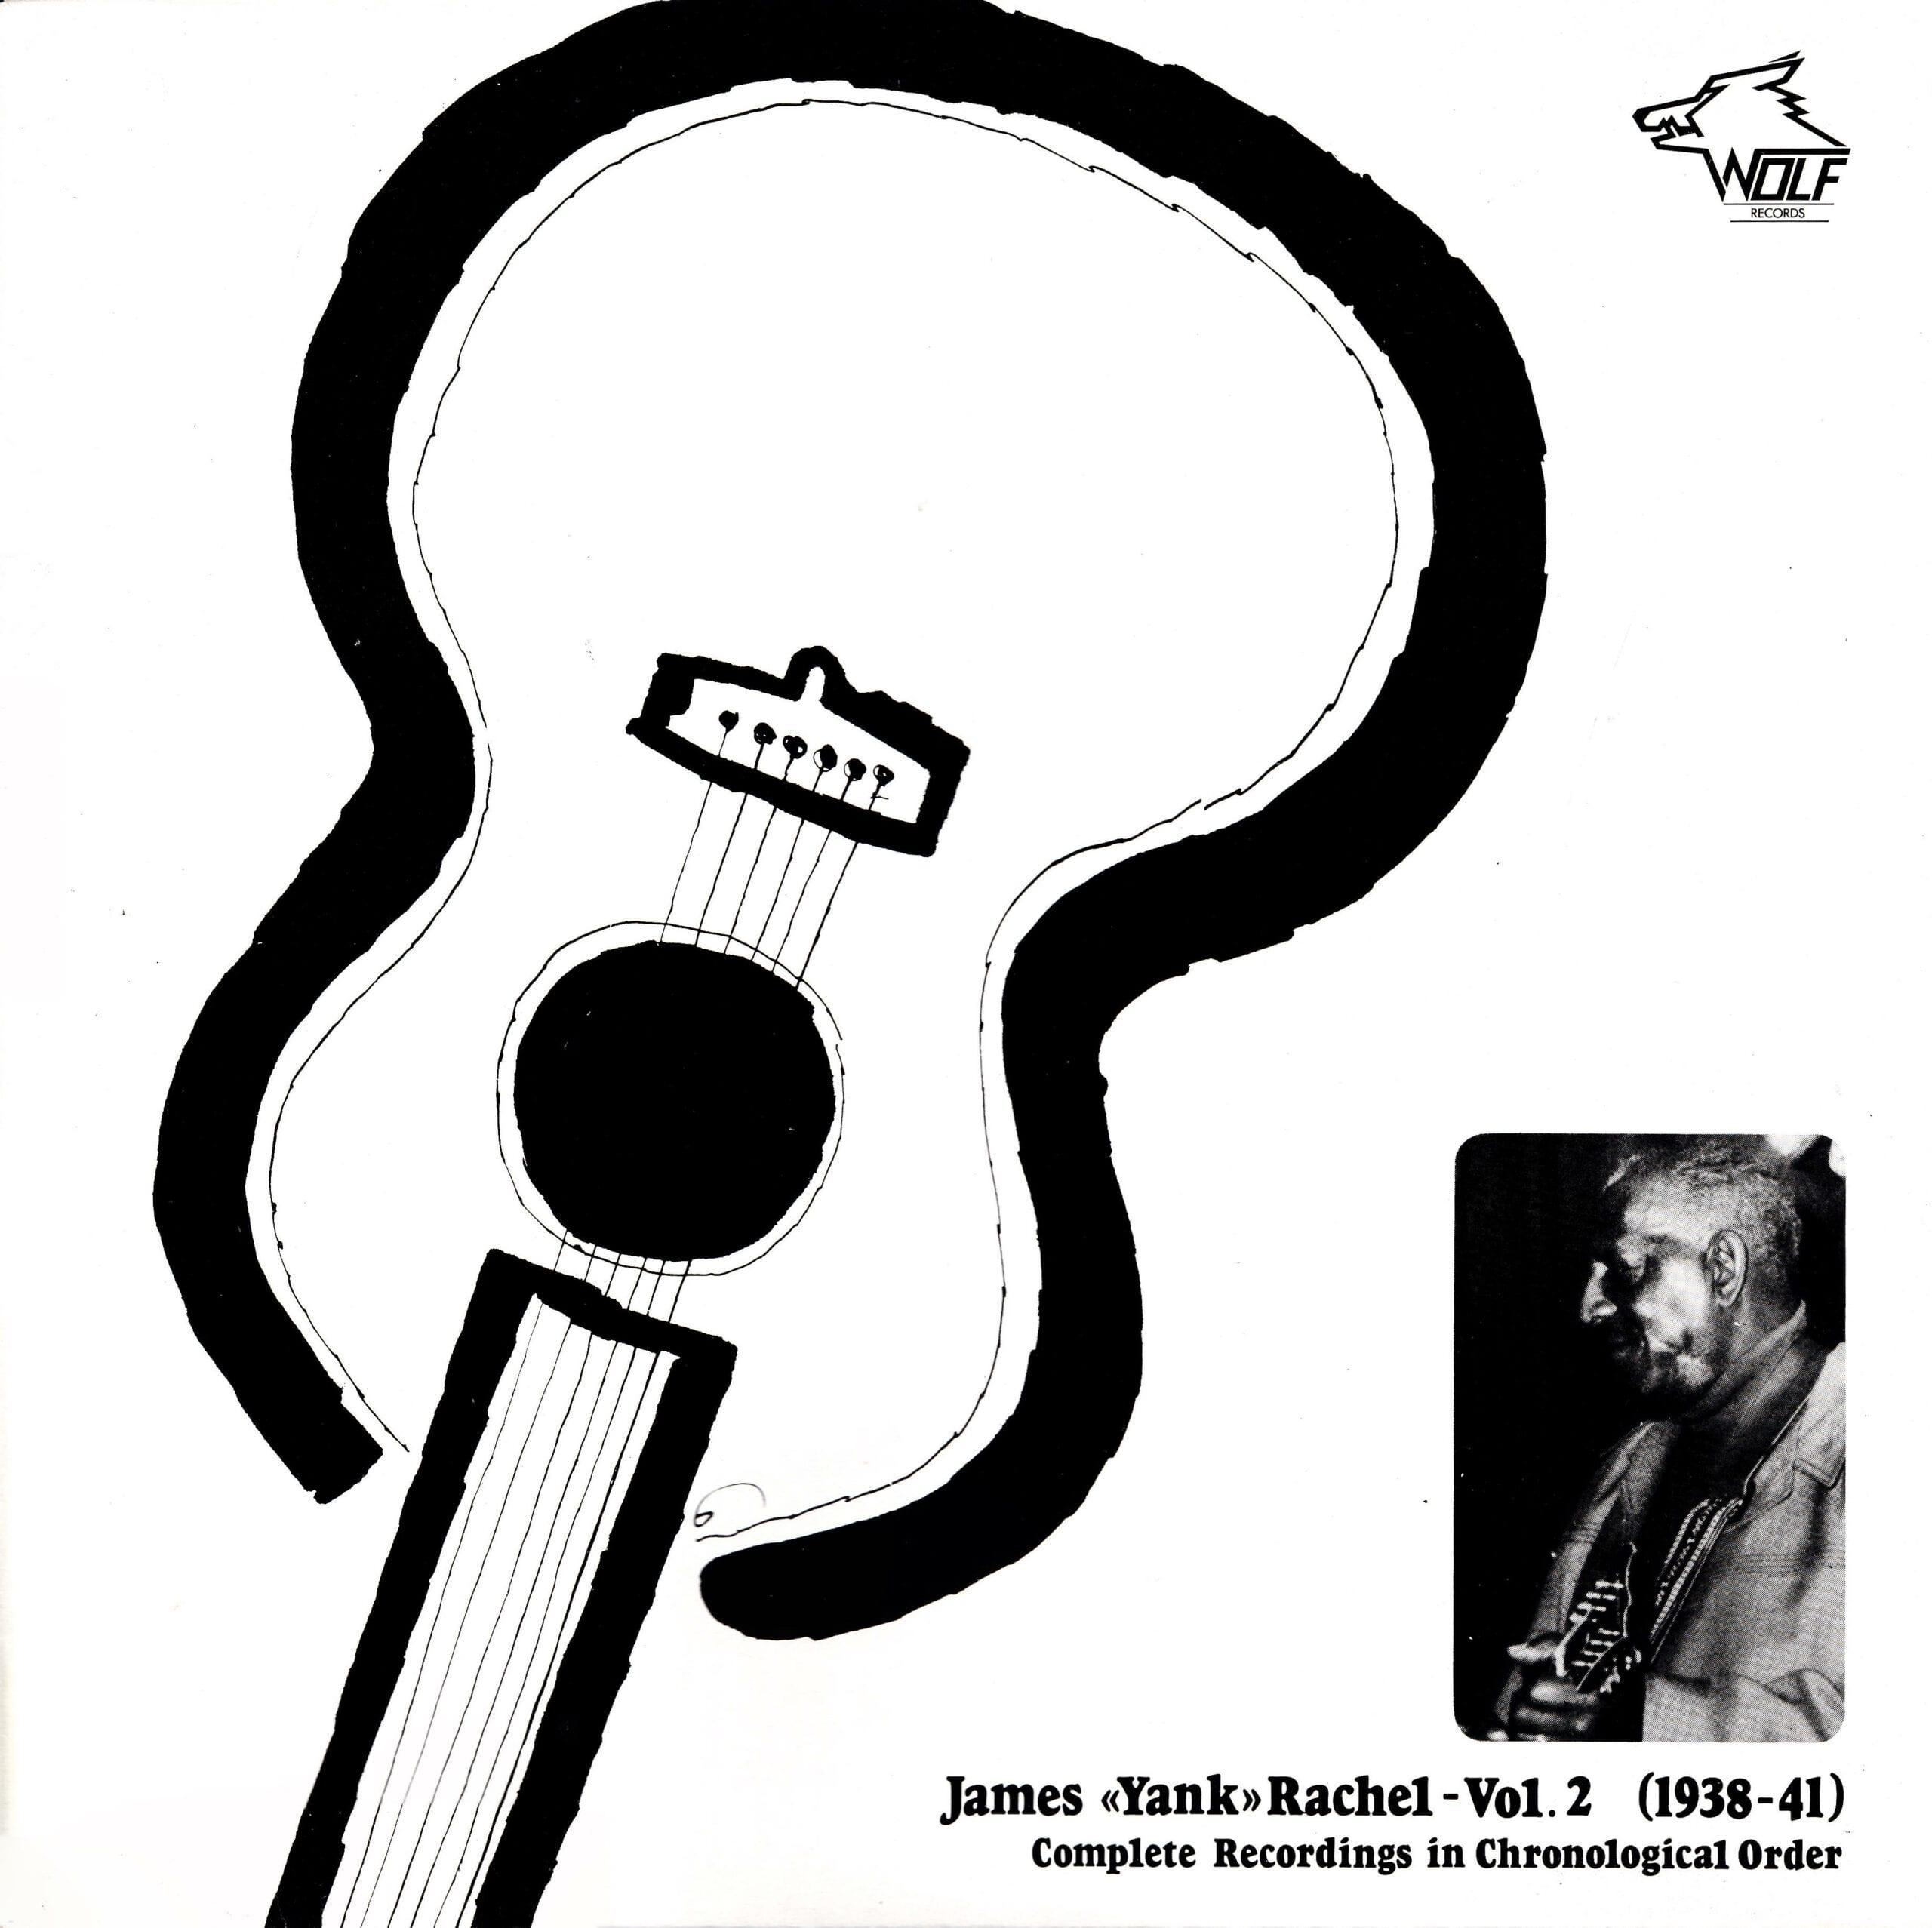 James Yank Rachel, Vol. 2 – 1